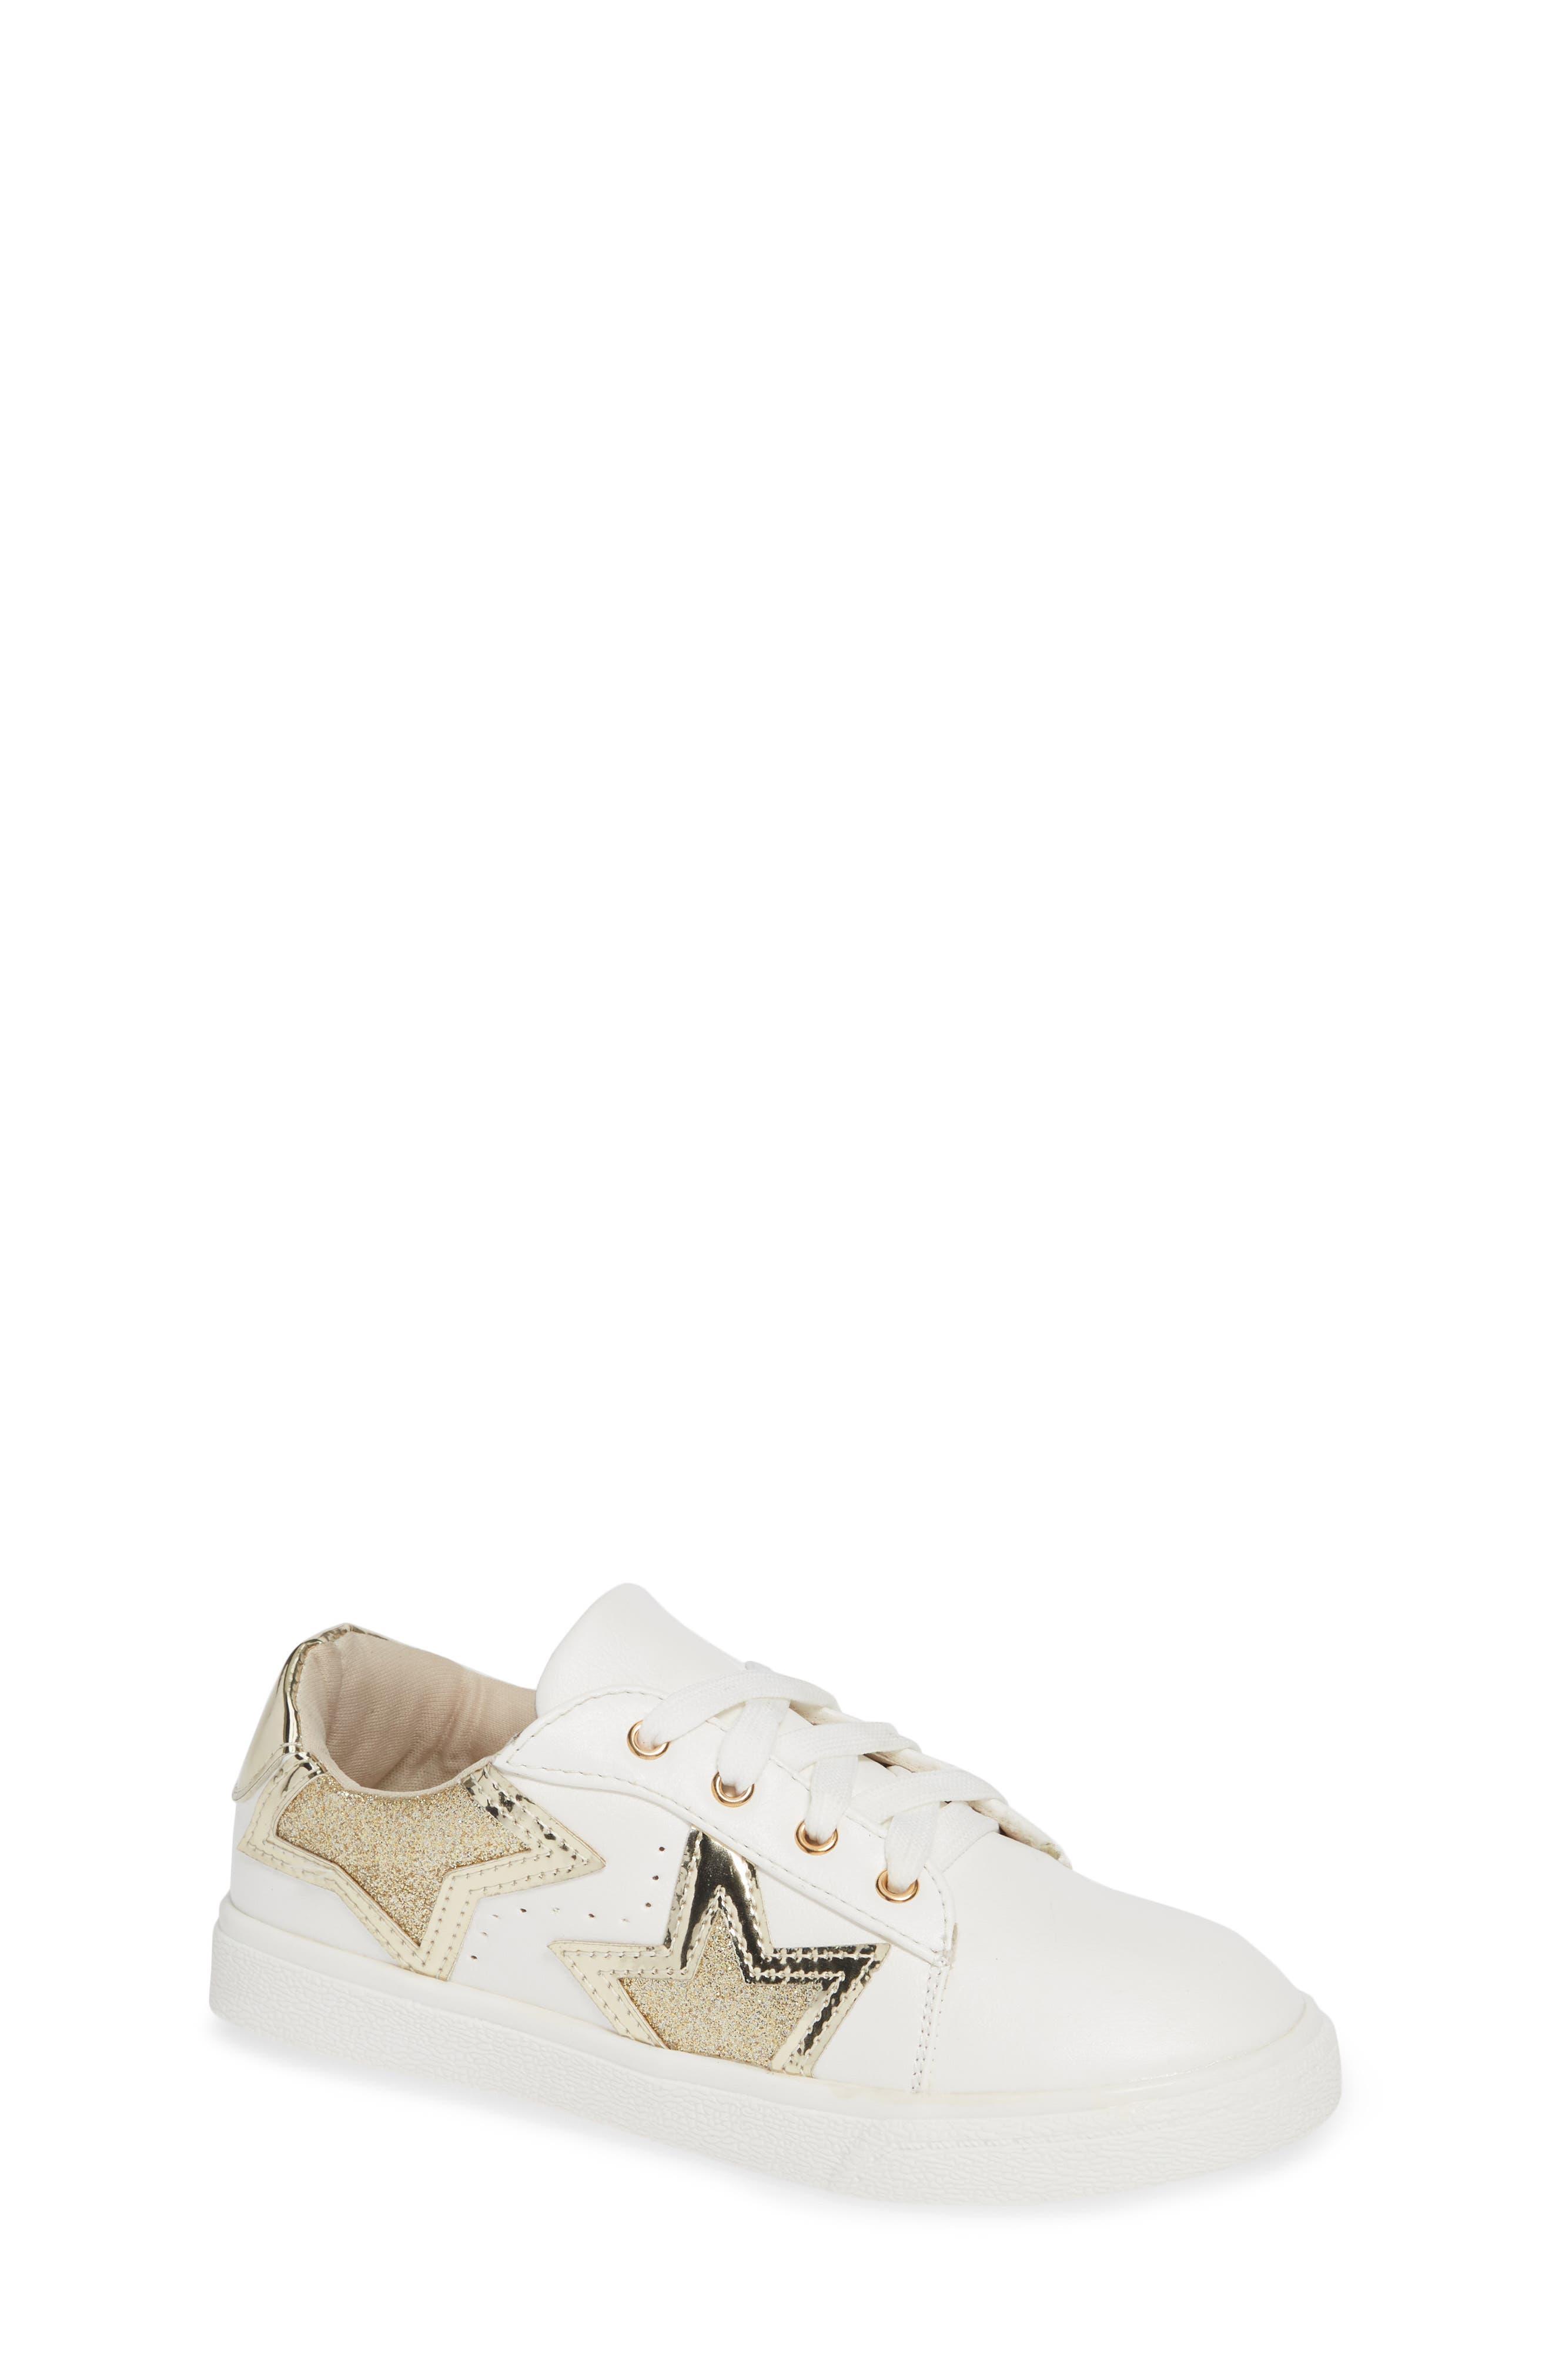 Miss Harper Appliqué Glitter Sneaker,                             Main thumbnail 1, color,                             WHITE W/ GOLD STAR